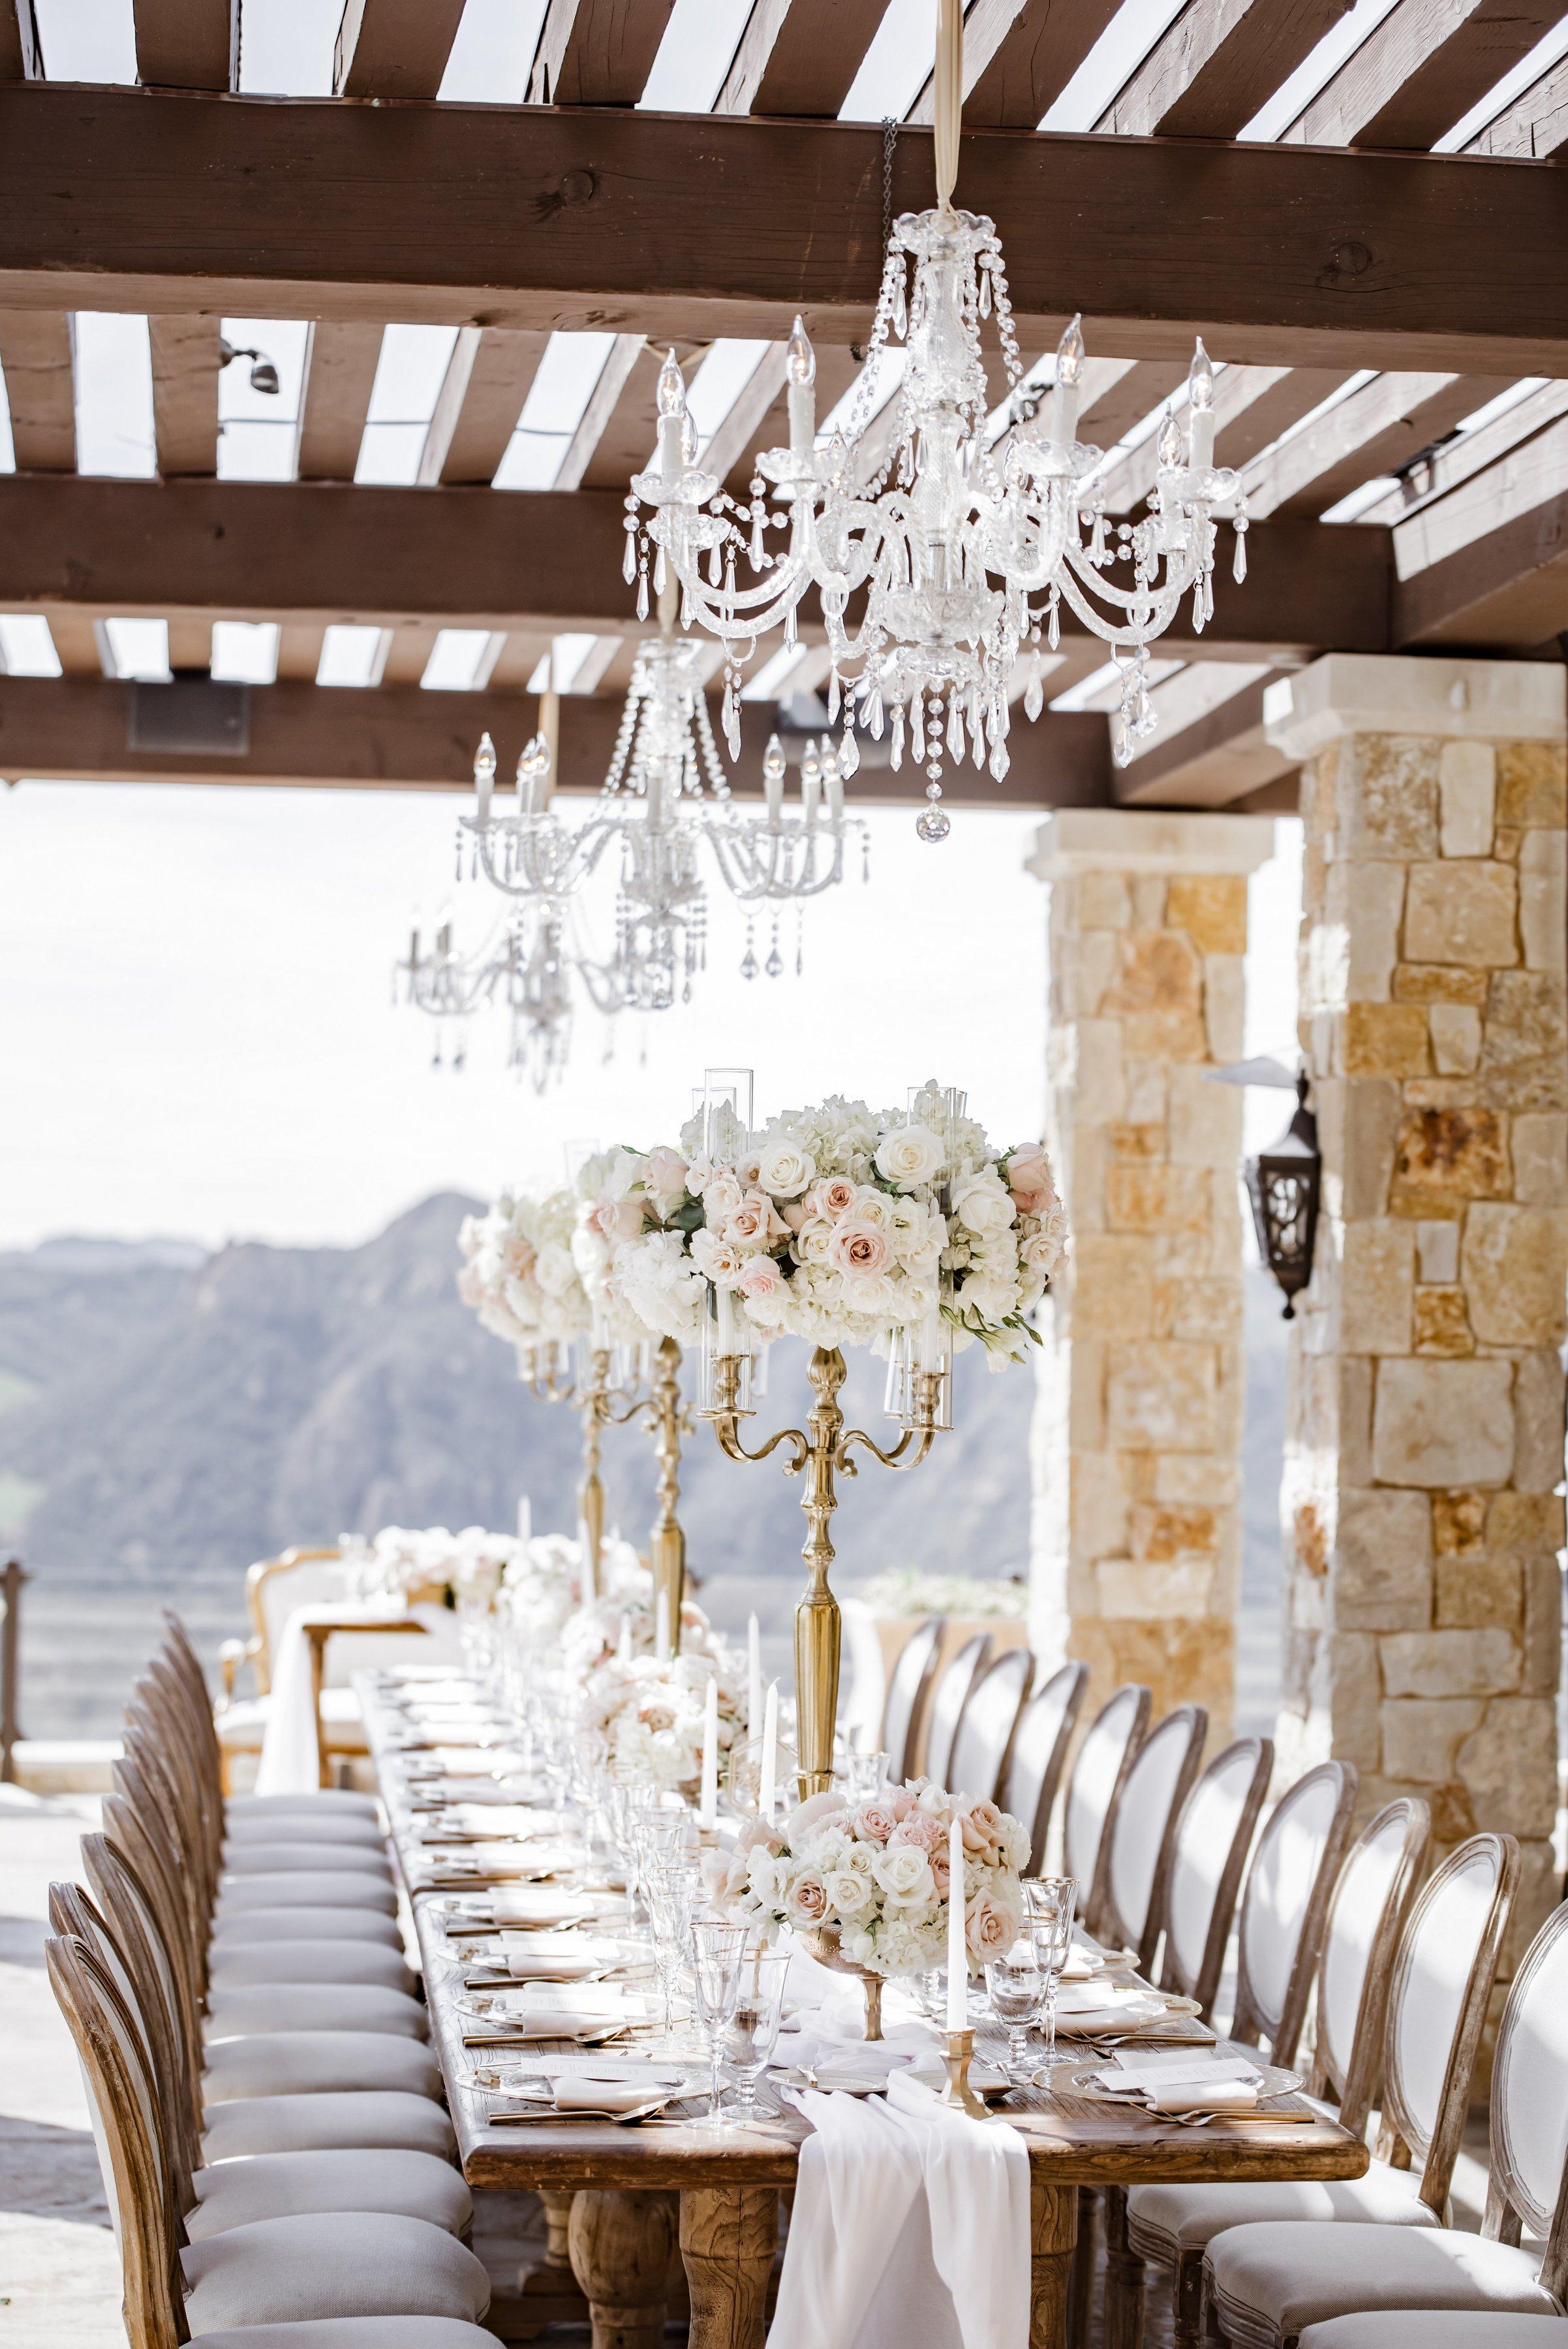 Malibu Rocky Oaks Wedding.Malibu Rocky Oaks Wedding Planner Nour Nadine Stylish Details